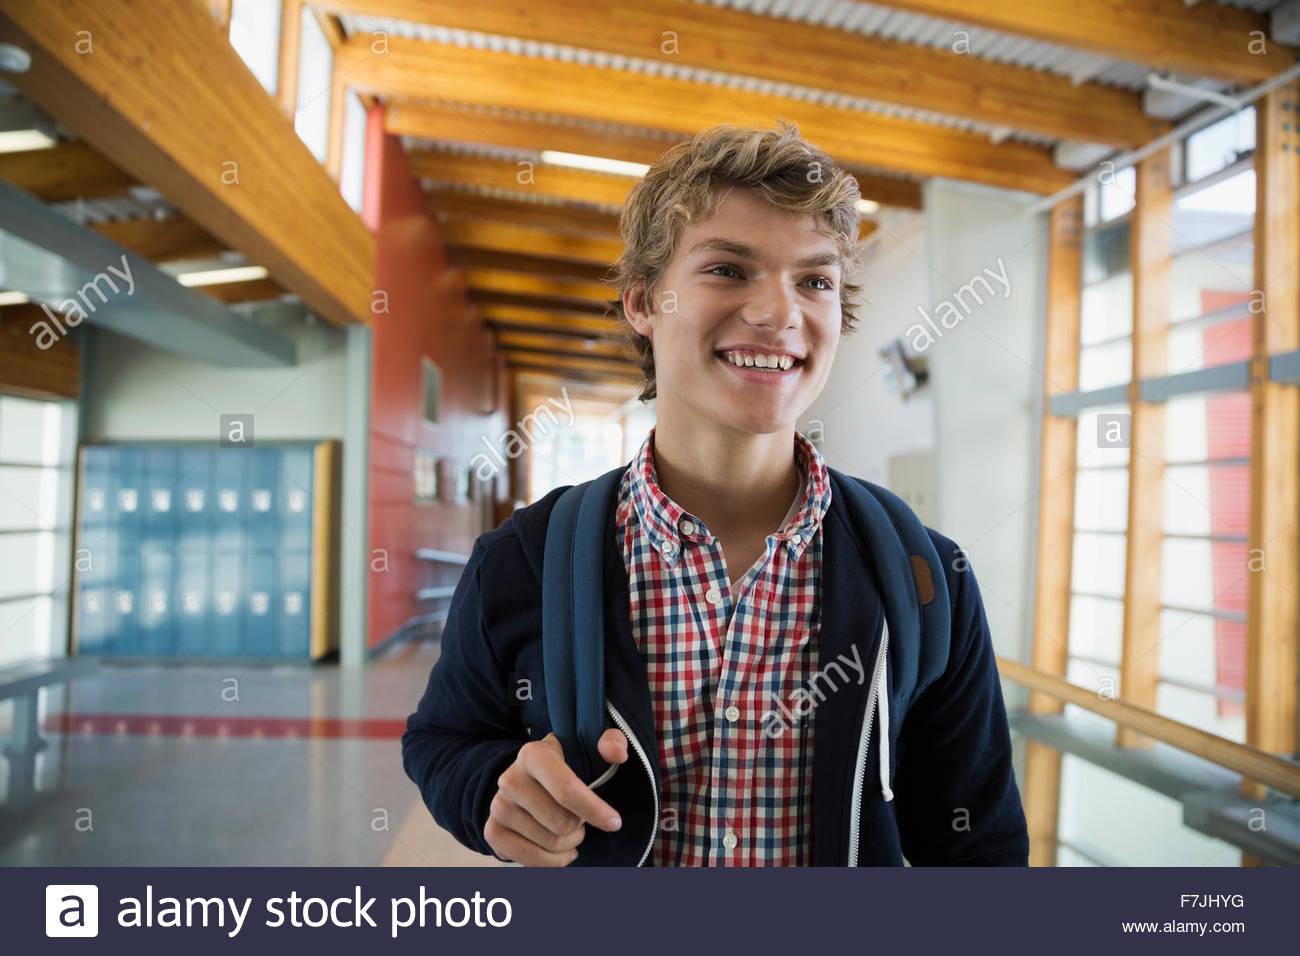 Lächelnde High-School-Schüler im Korridor Stockbild